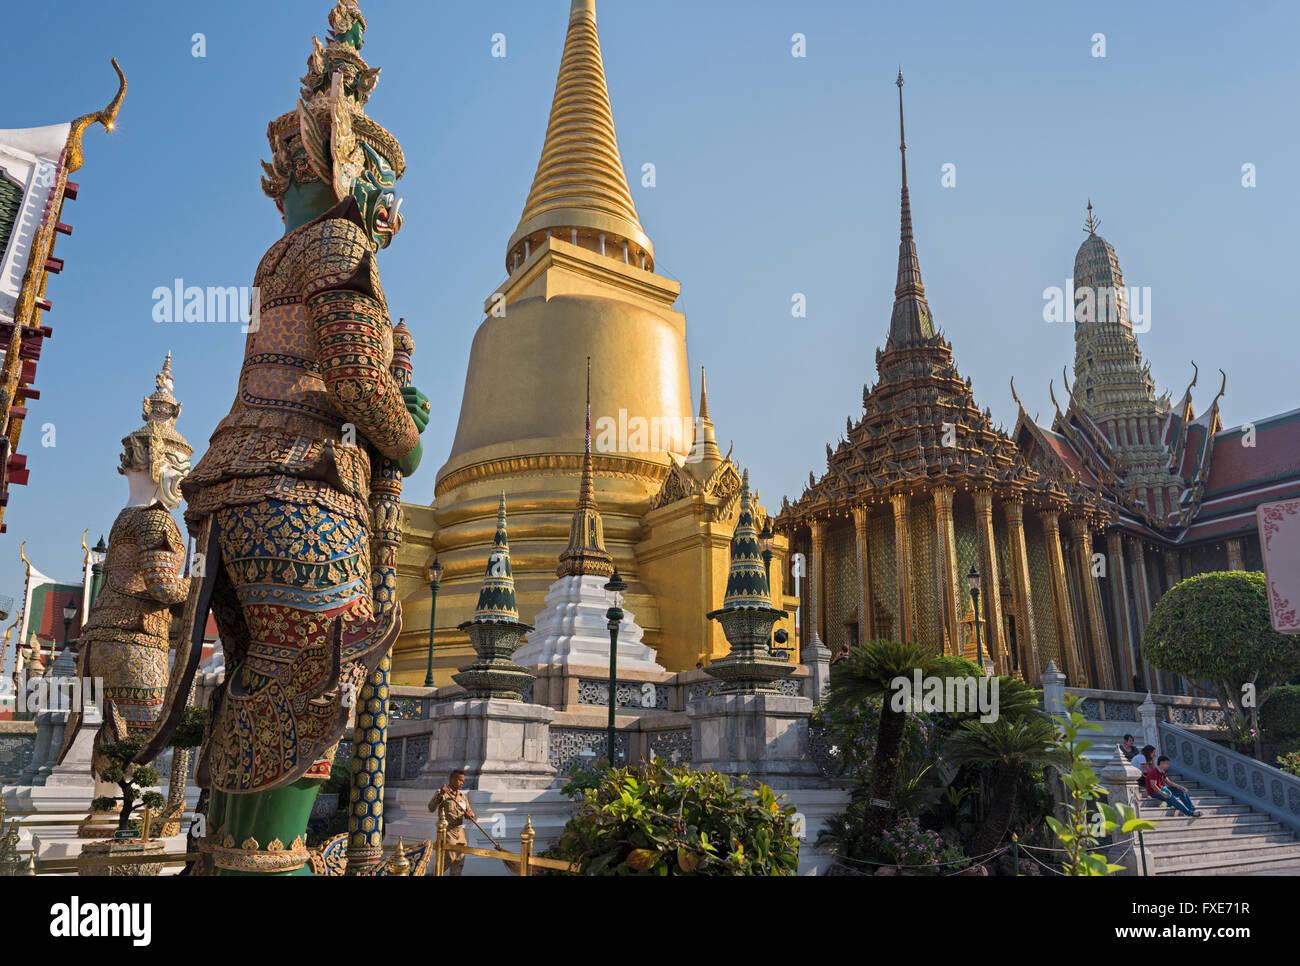 Wat Phra Kaew Palace Bangkok Thaïlande Photo Stock